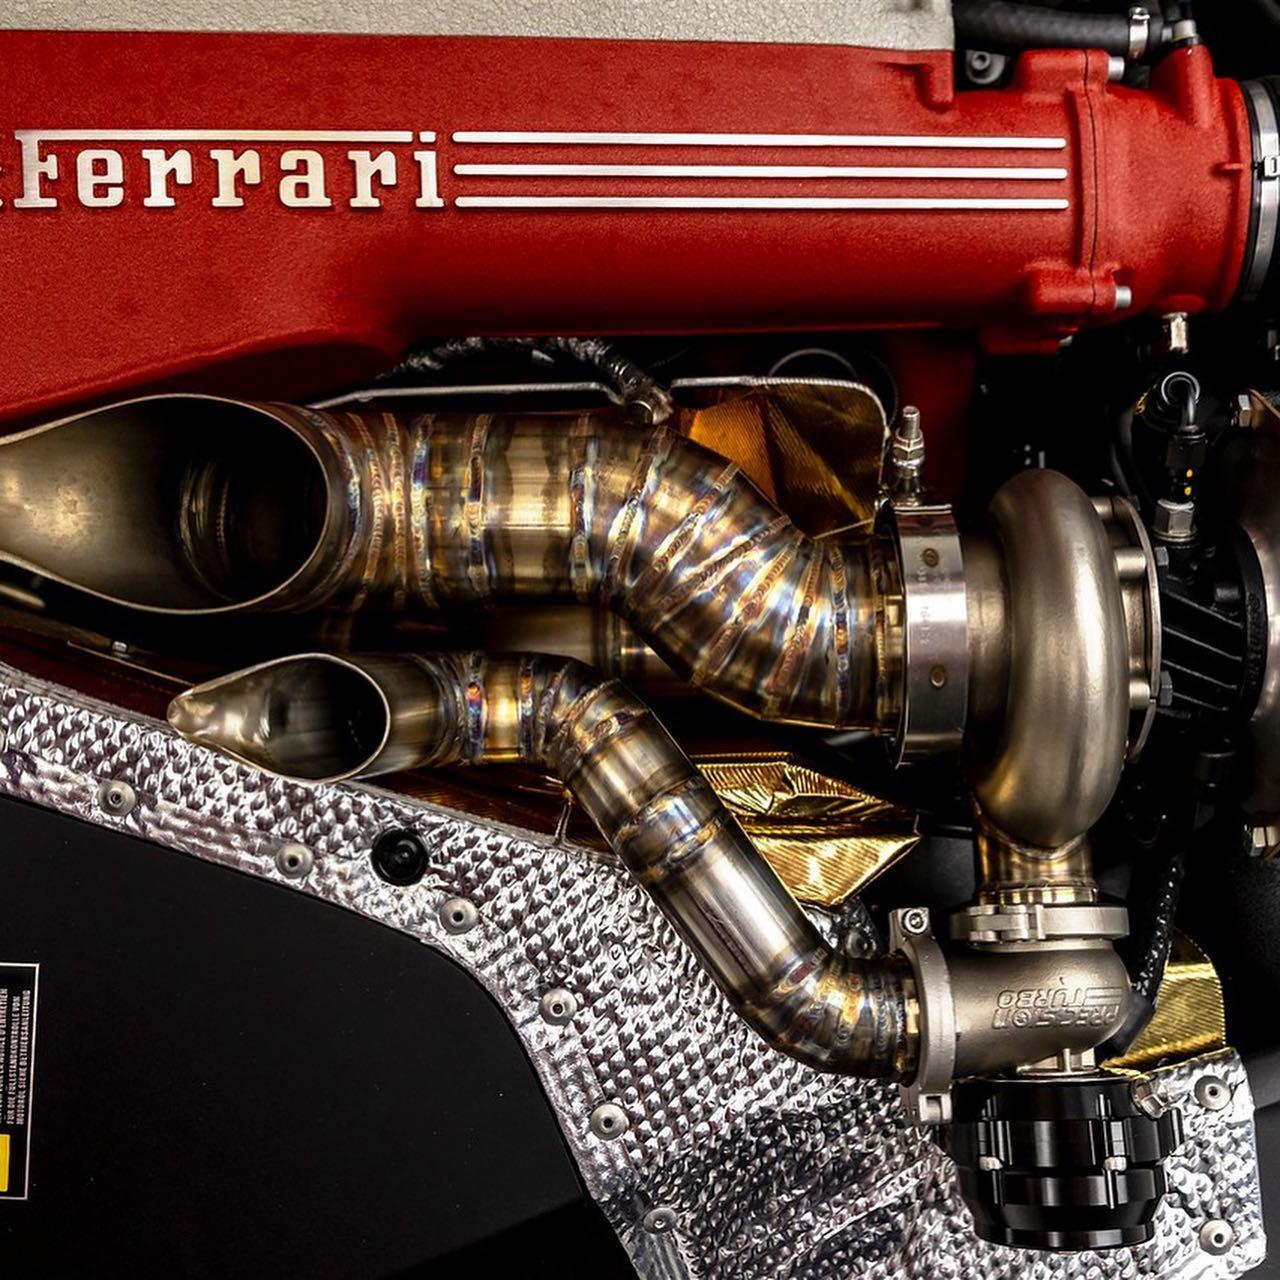 Twin-Turbo-Ferrari-F12-Berlinetta-by-Daily-Driven-Exotics-14